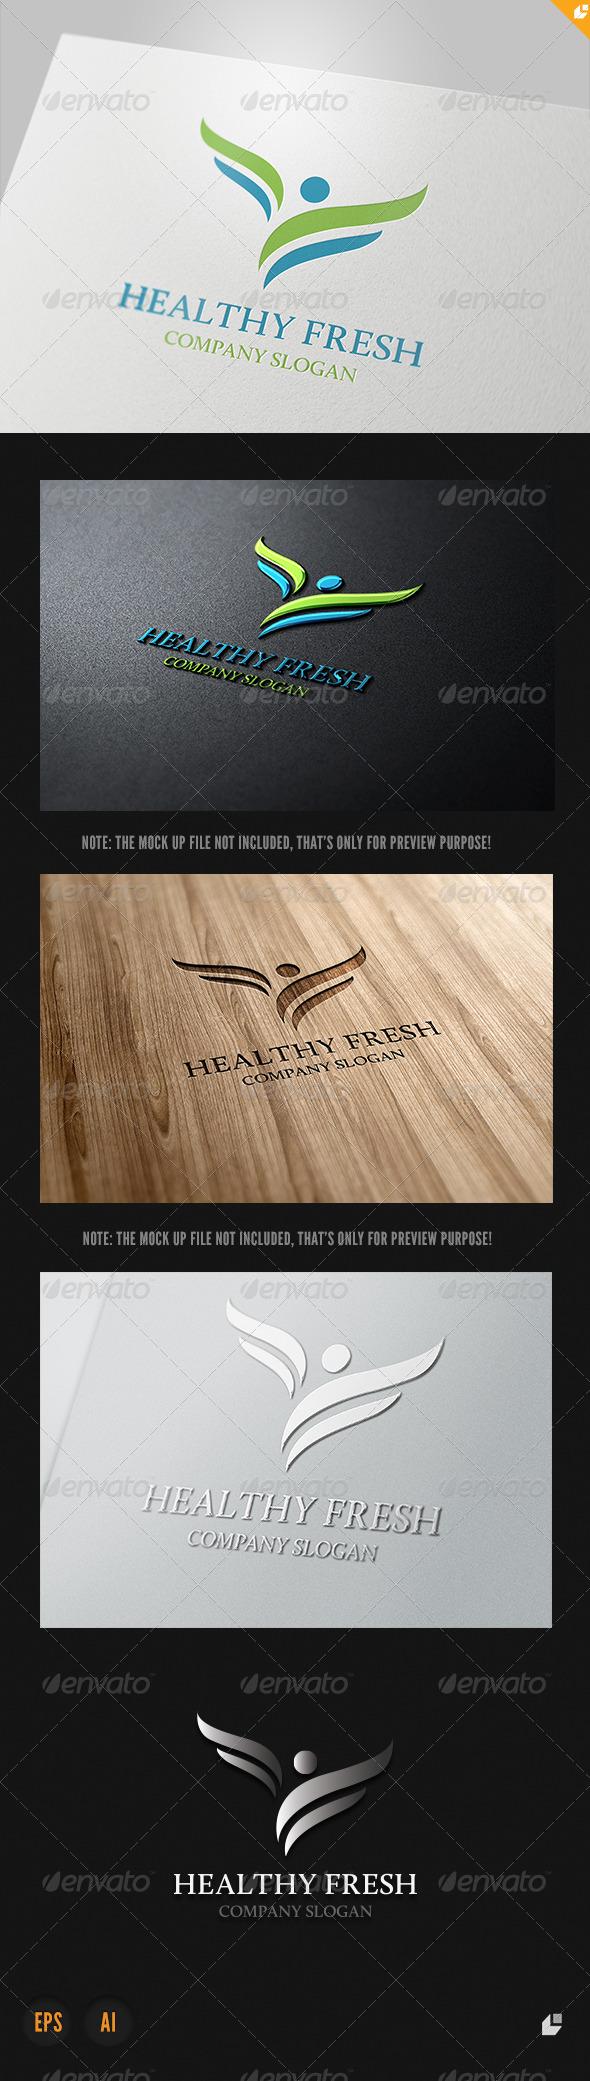 GraphicRiver Healthy Fresh Logo 4052810